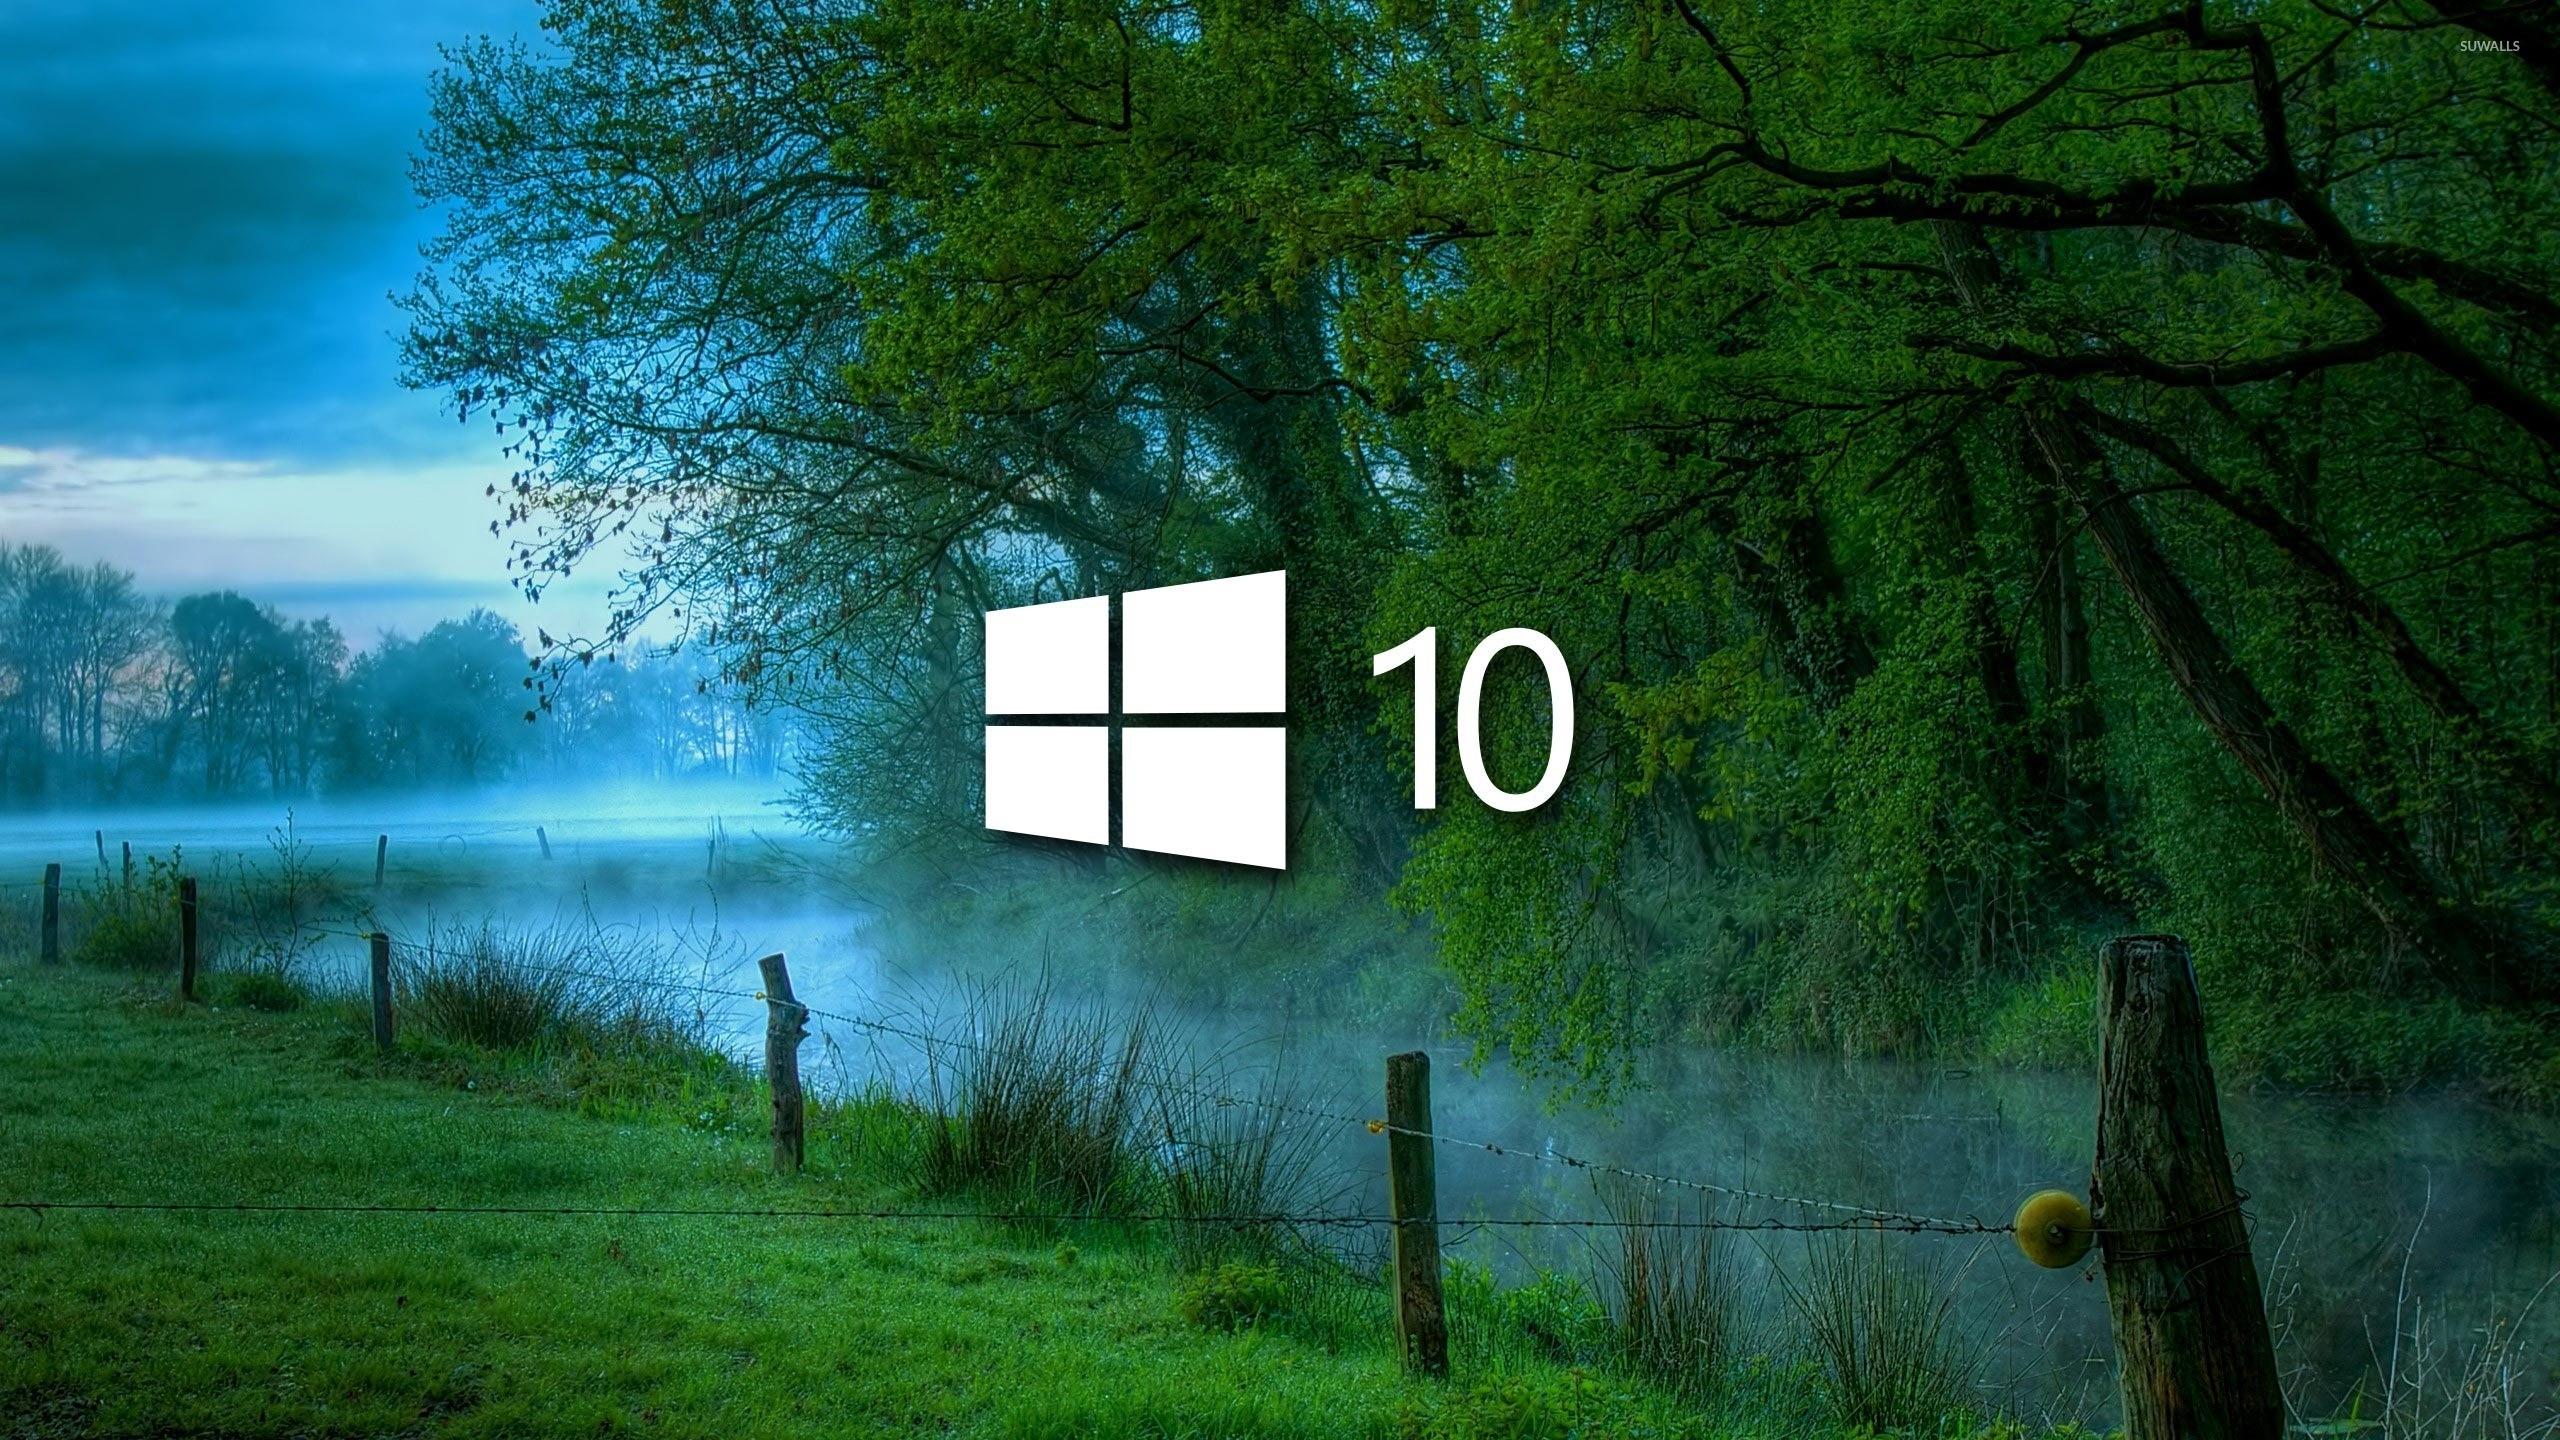 Microsoft Animated Wallpaper Windows 10 Logo Hd Wallpaper 74 Images